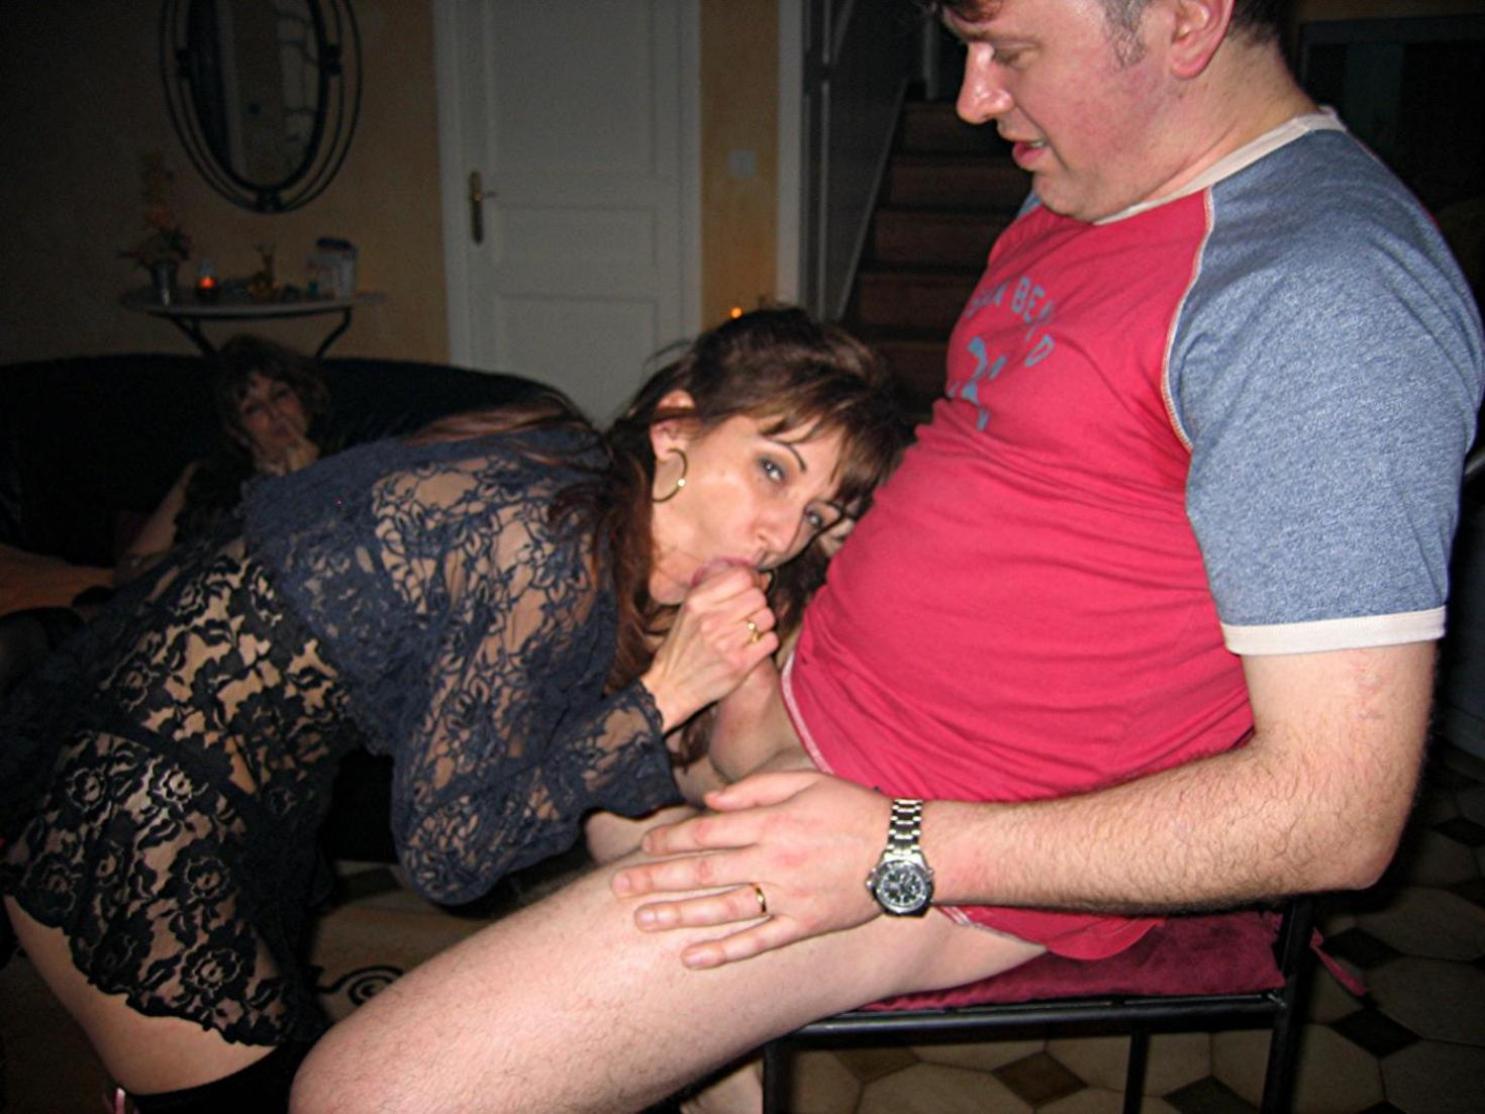 найти пару в питере сейчас для интима